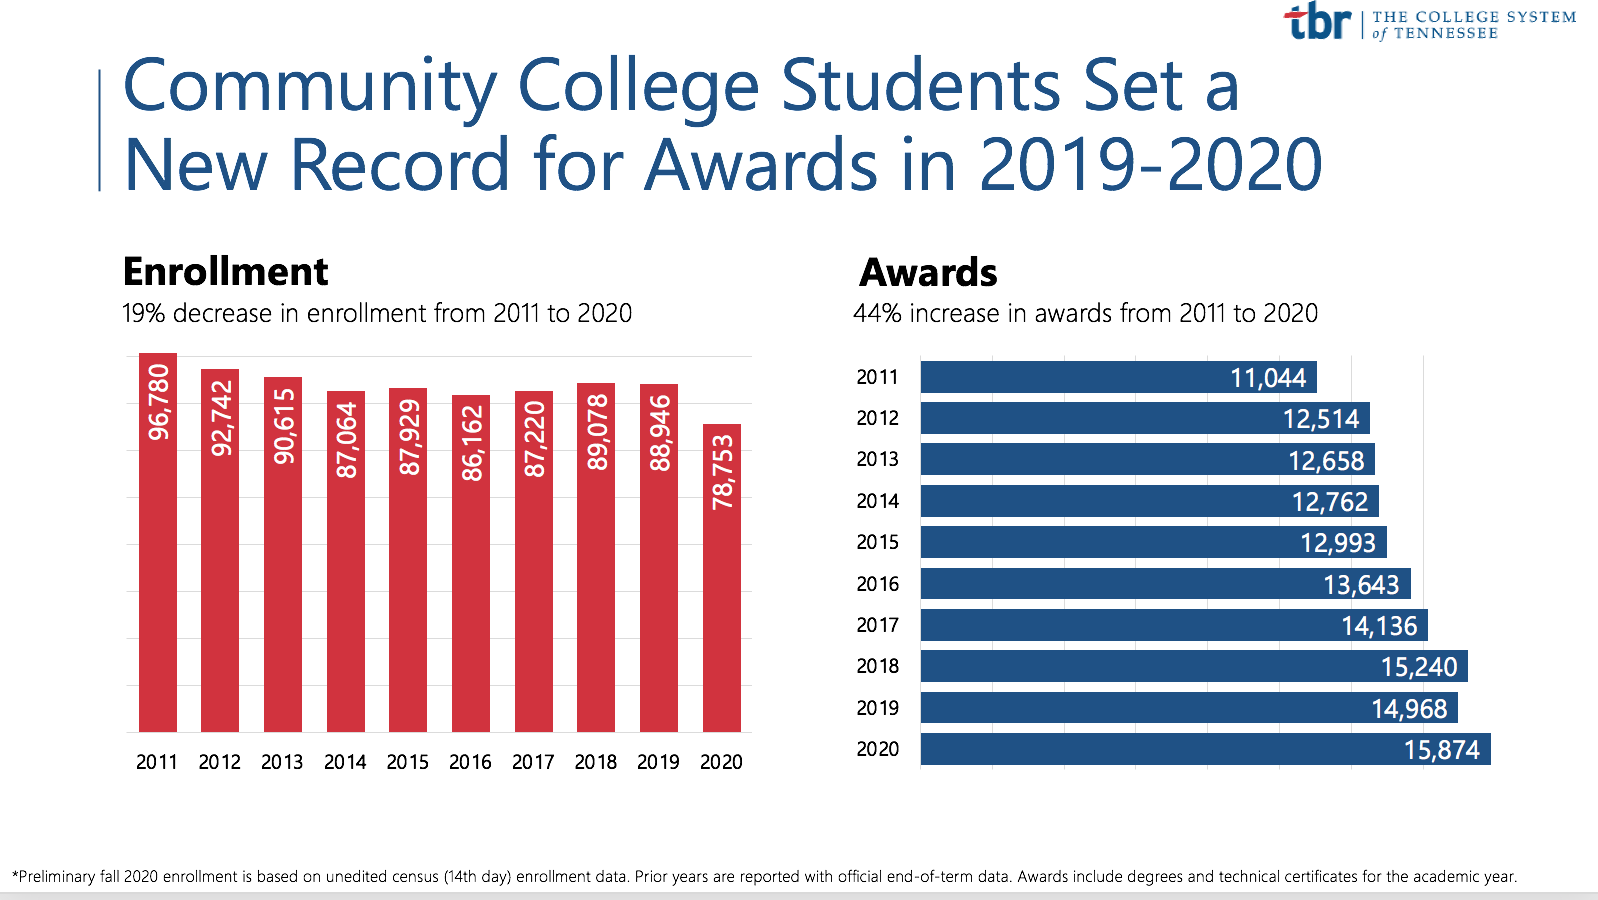 TBR Community College Awards & Enrollment, 2011-2020